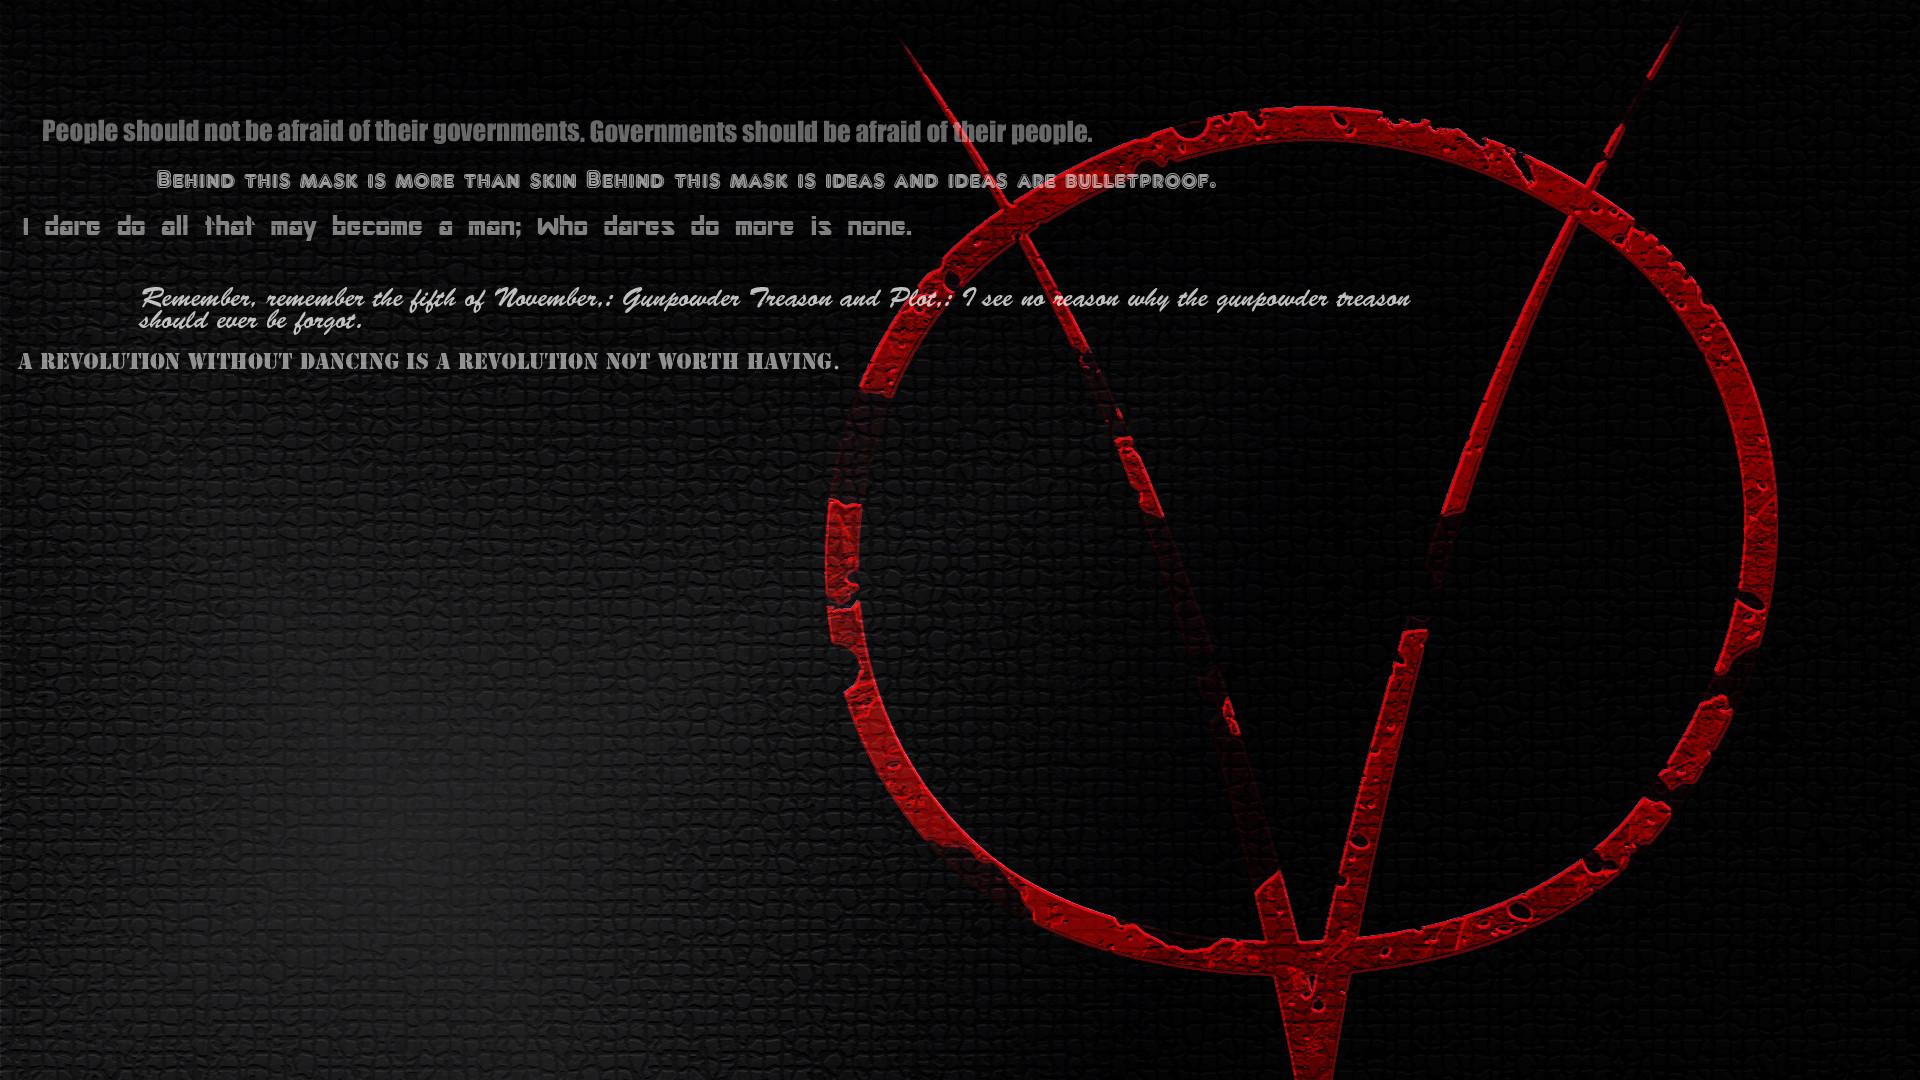 1920x1080 V Vendetta HQFX Pics Download 2160x3840 Liked Like Share